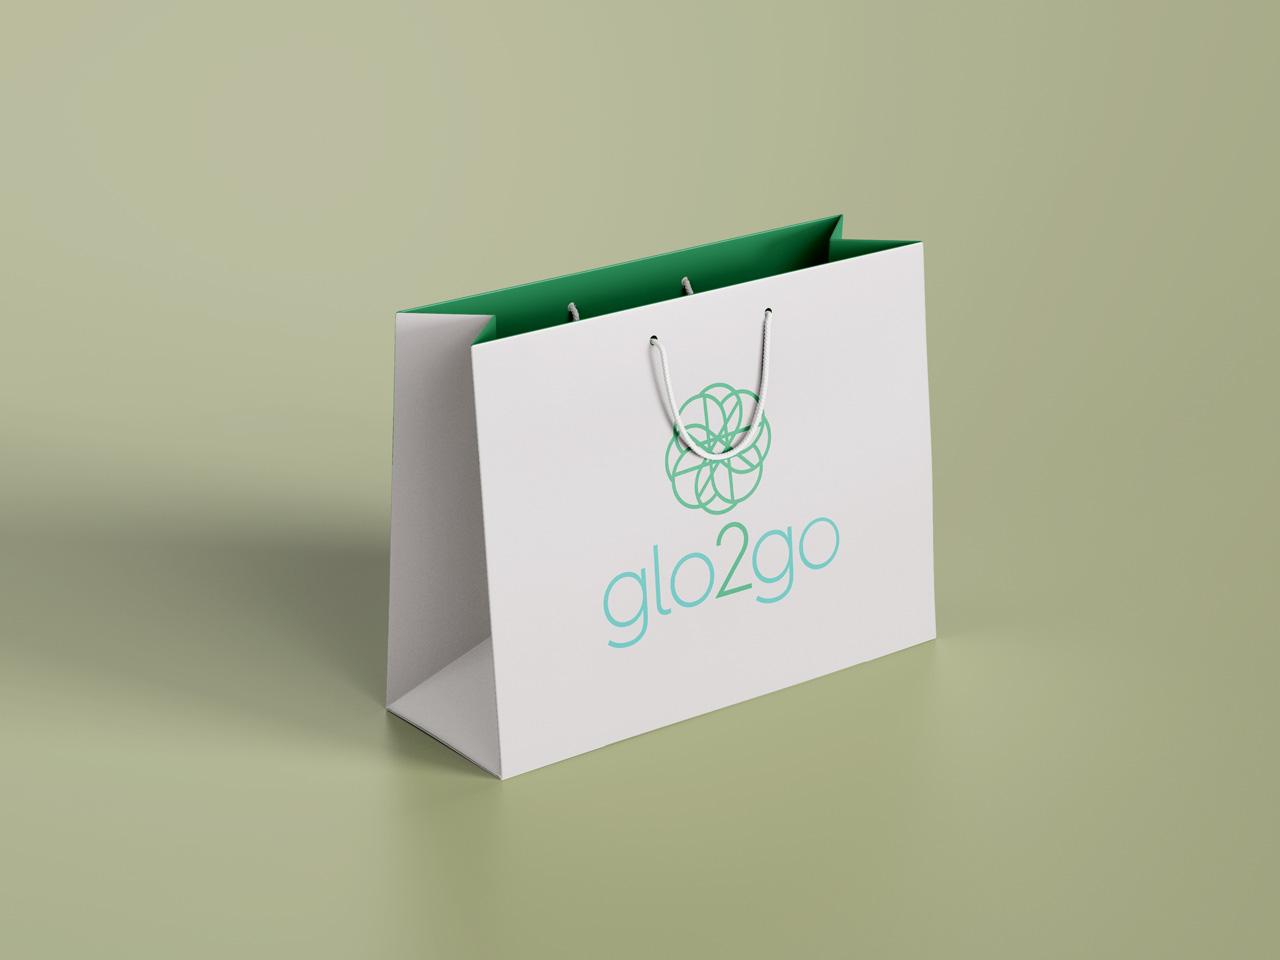 project glo2go logo on bag